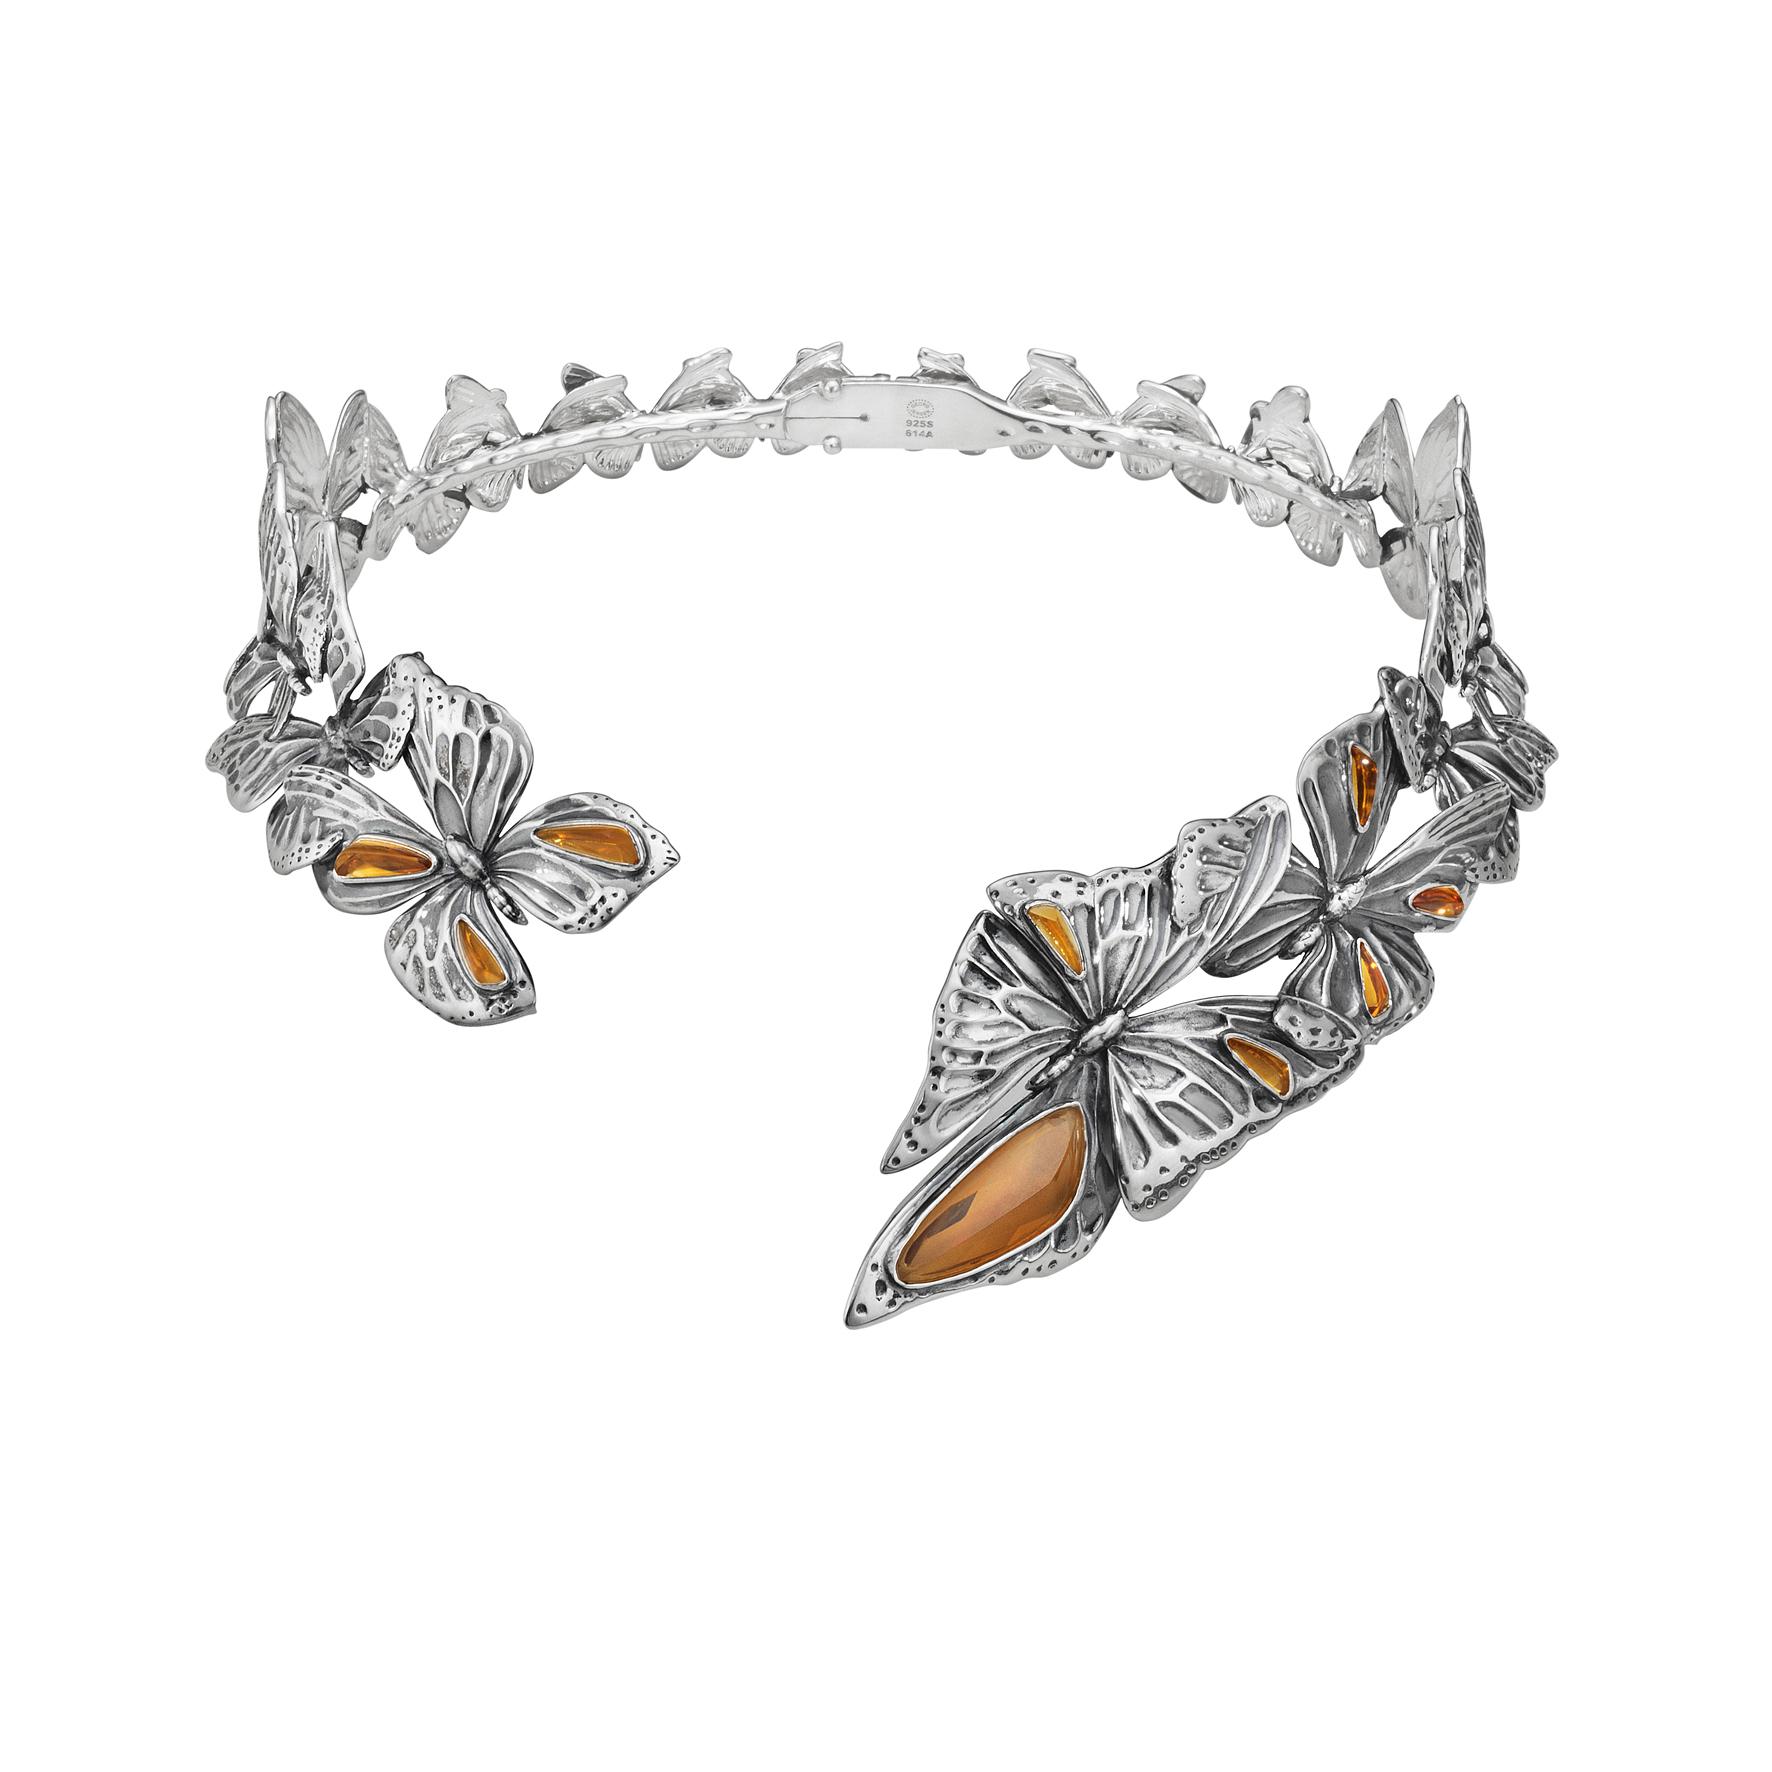 ASKILL 項圈 - 氧化純銀,鑲嵌黃晶建議售價144,500